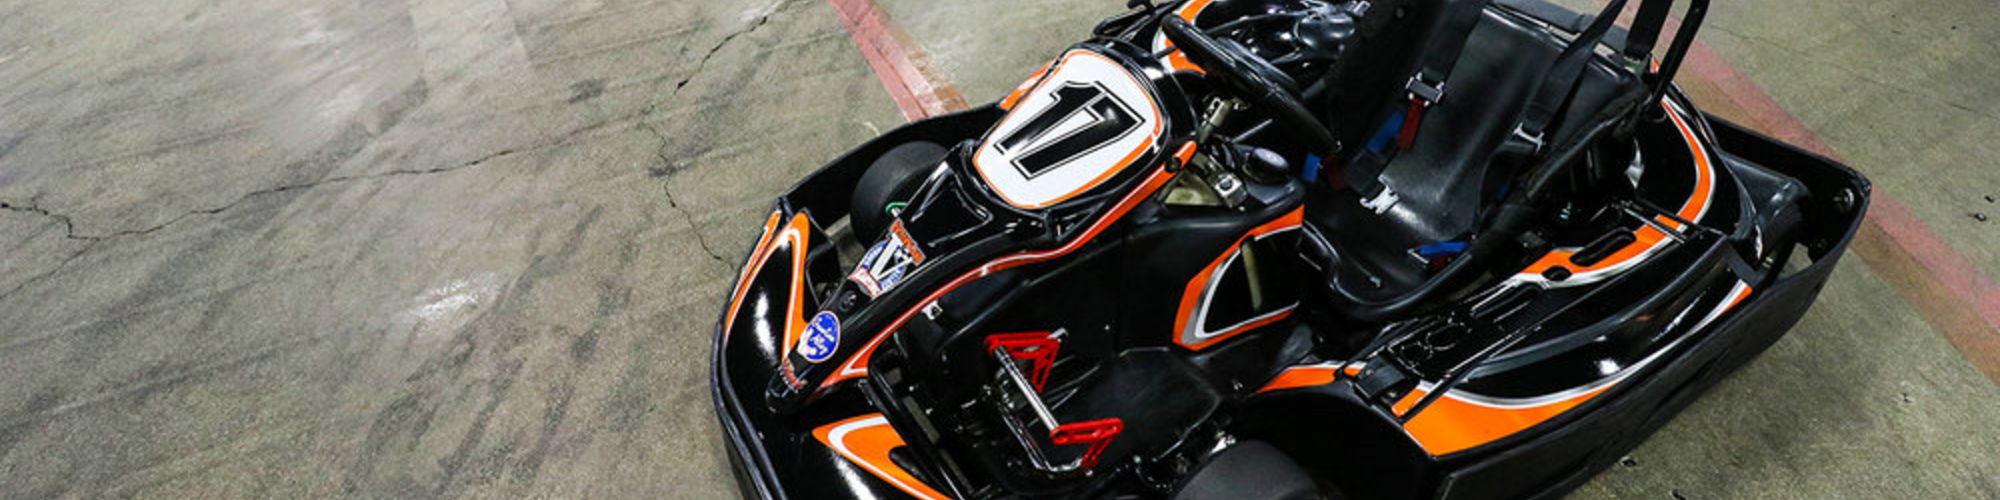 44622f5b314 Victory Lane Indoor Karting | Motorsportjobs.com